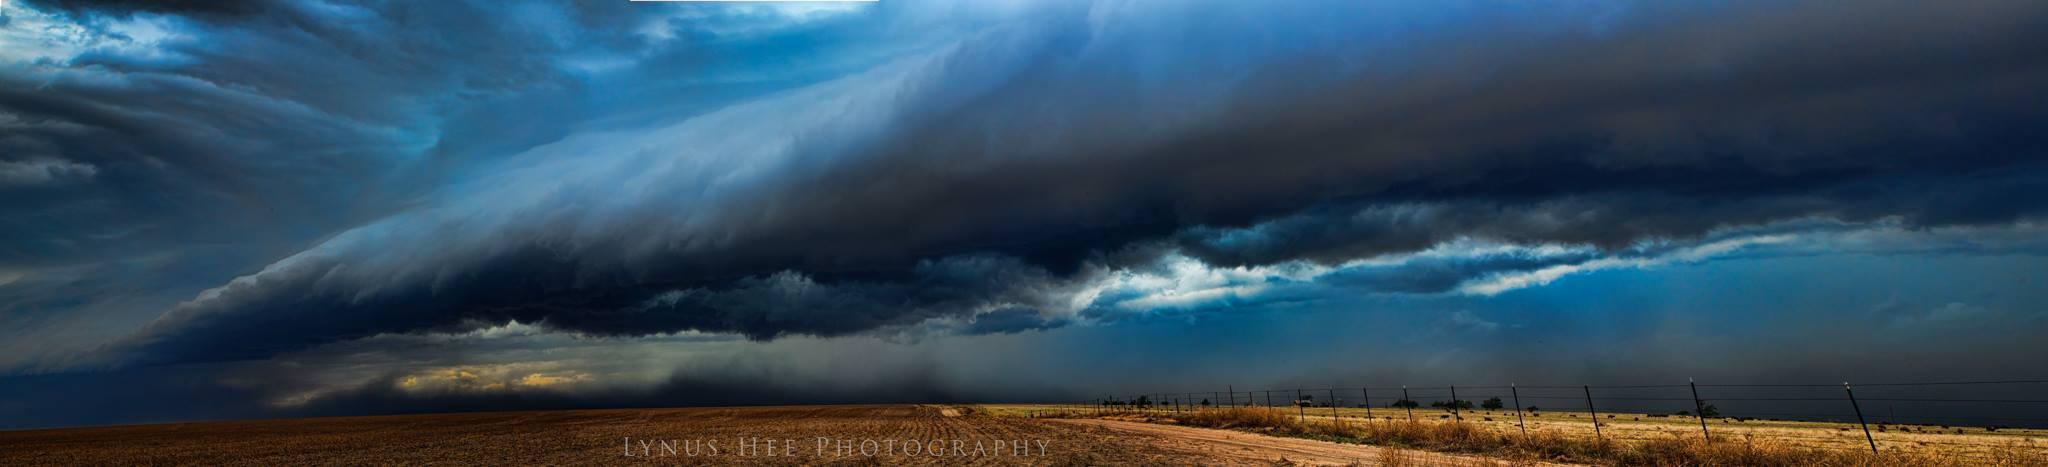 Storm Chasing 002.jpg